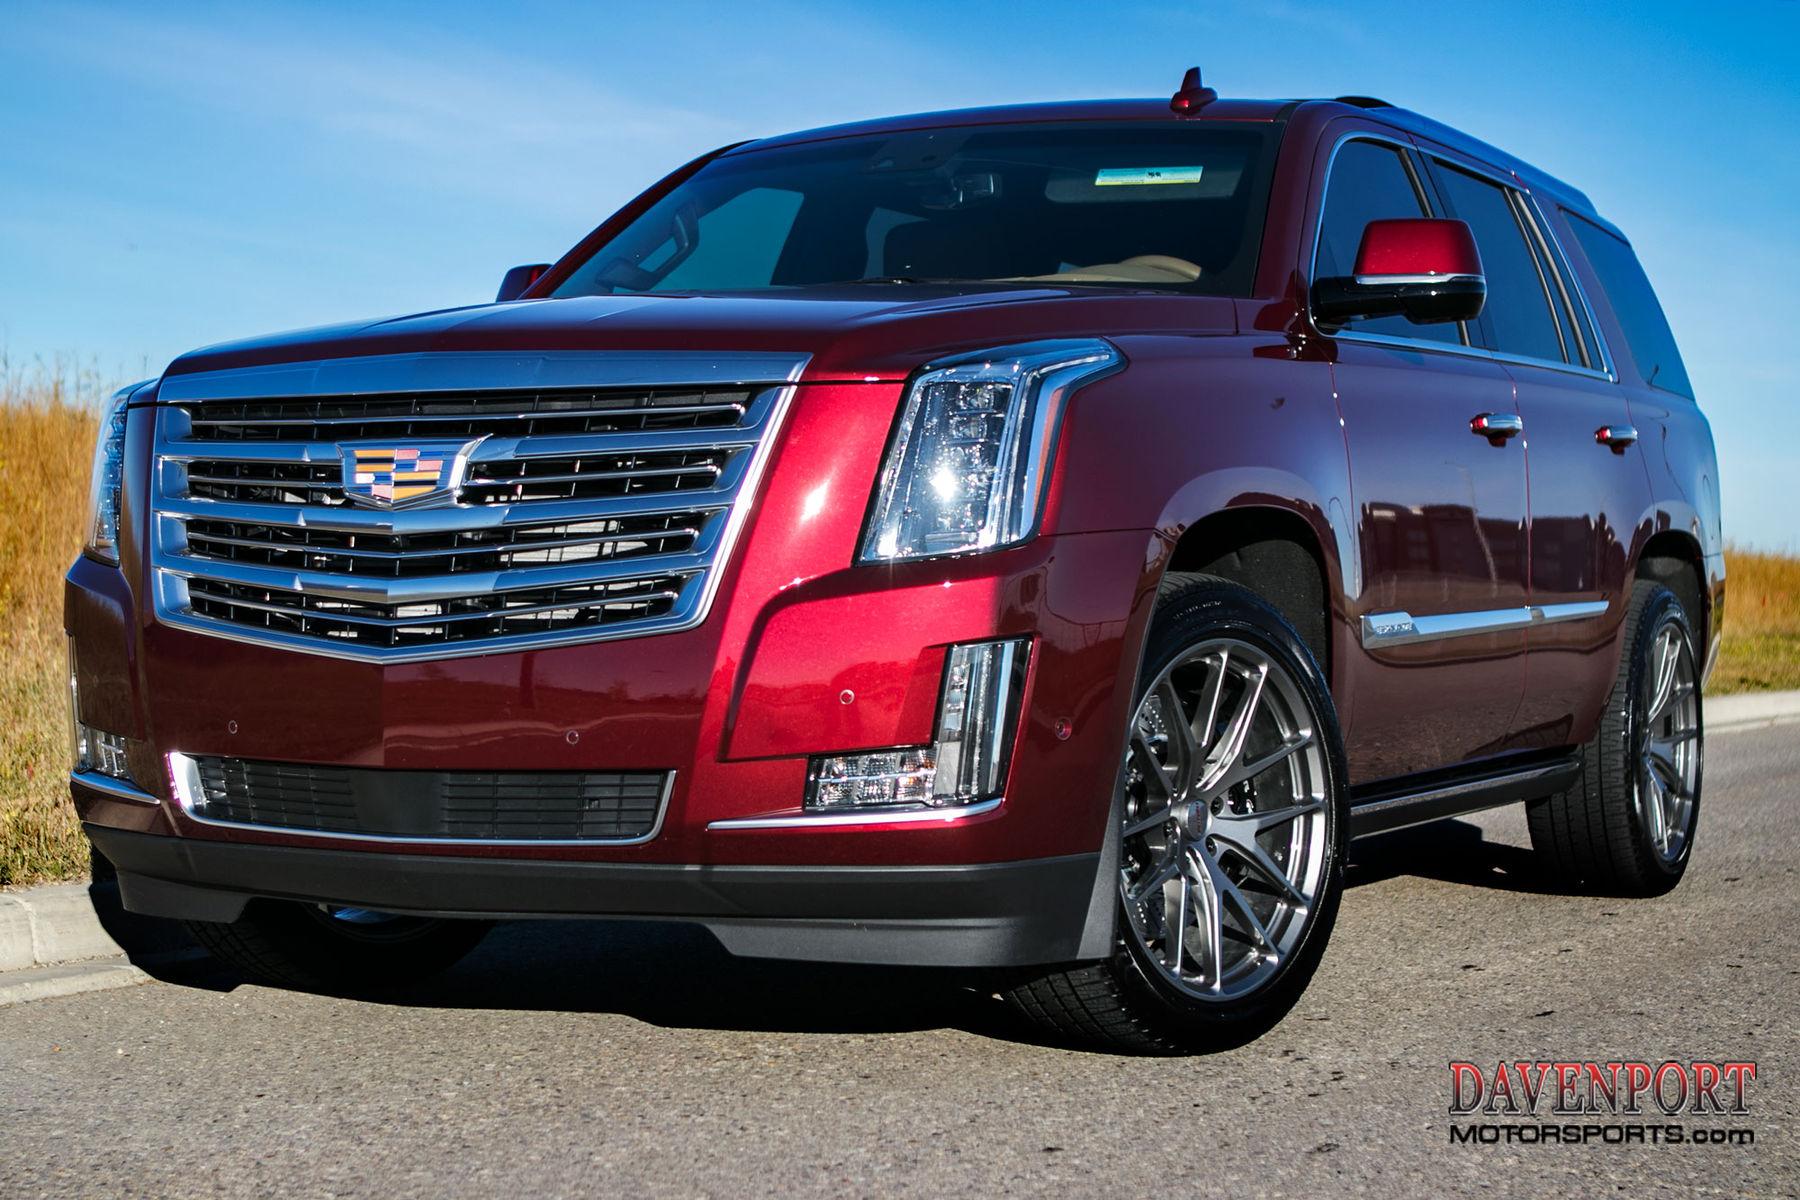 2017 Cadillac Escalade | Gord B's Davenport-Tuned Cadillac Escalade on Forgeline One Piece Forged Monoblock VX1-Truck Wheels